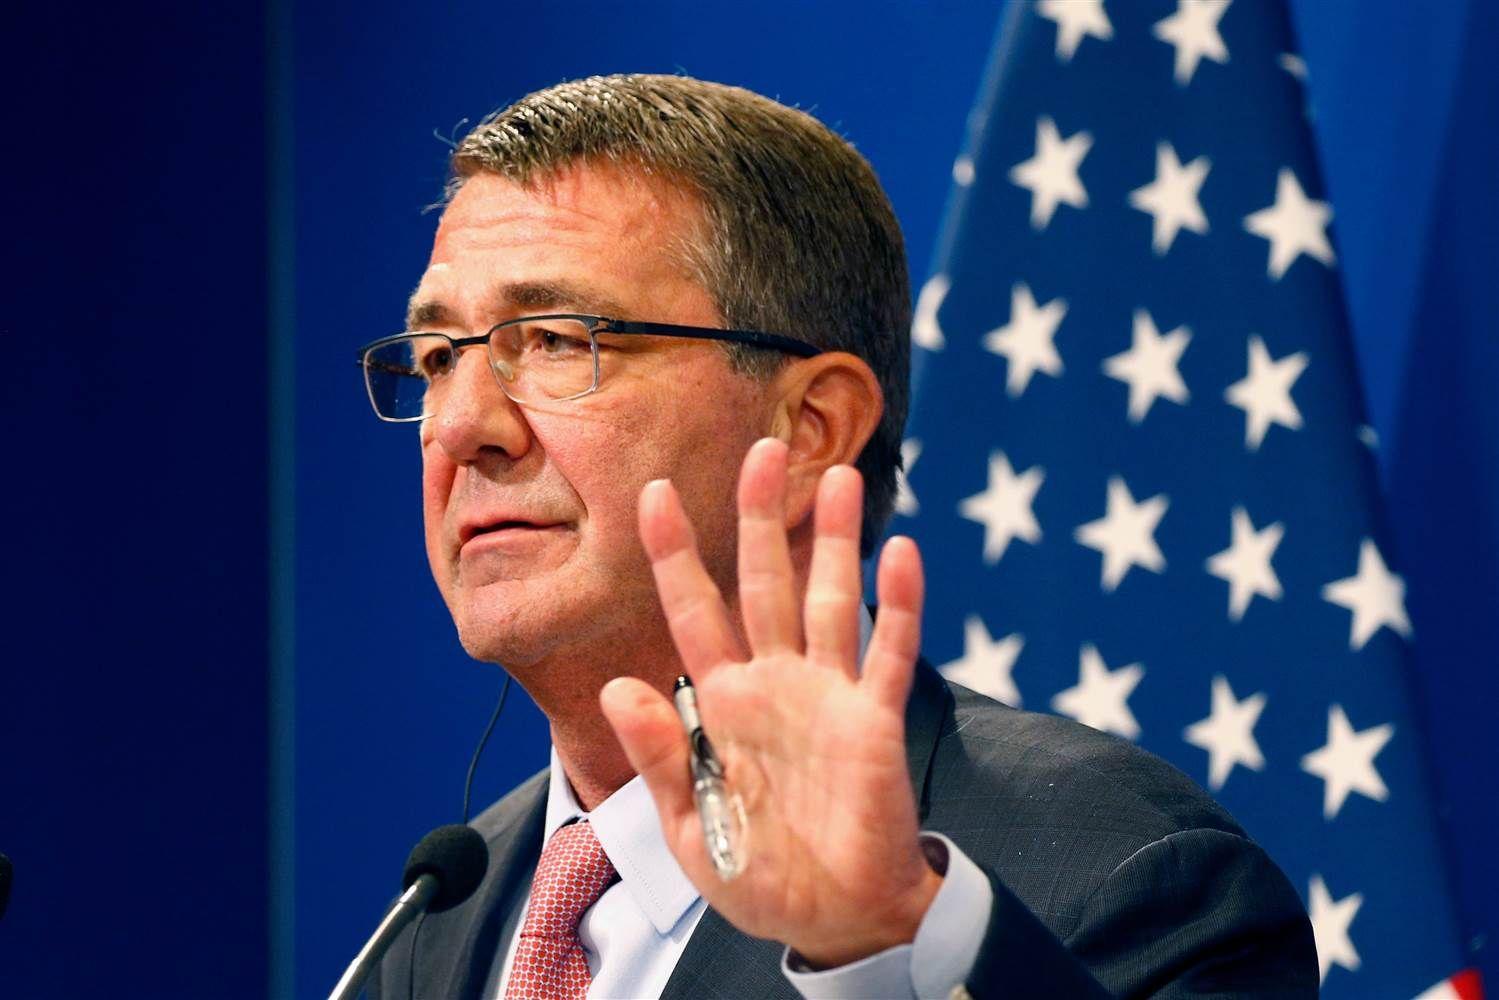 Image: Defense Secretary Ashton Carter